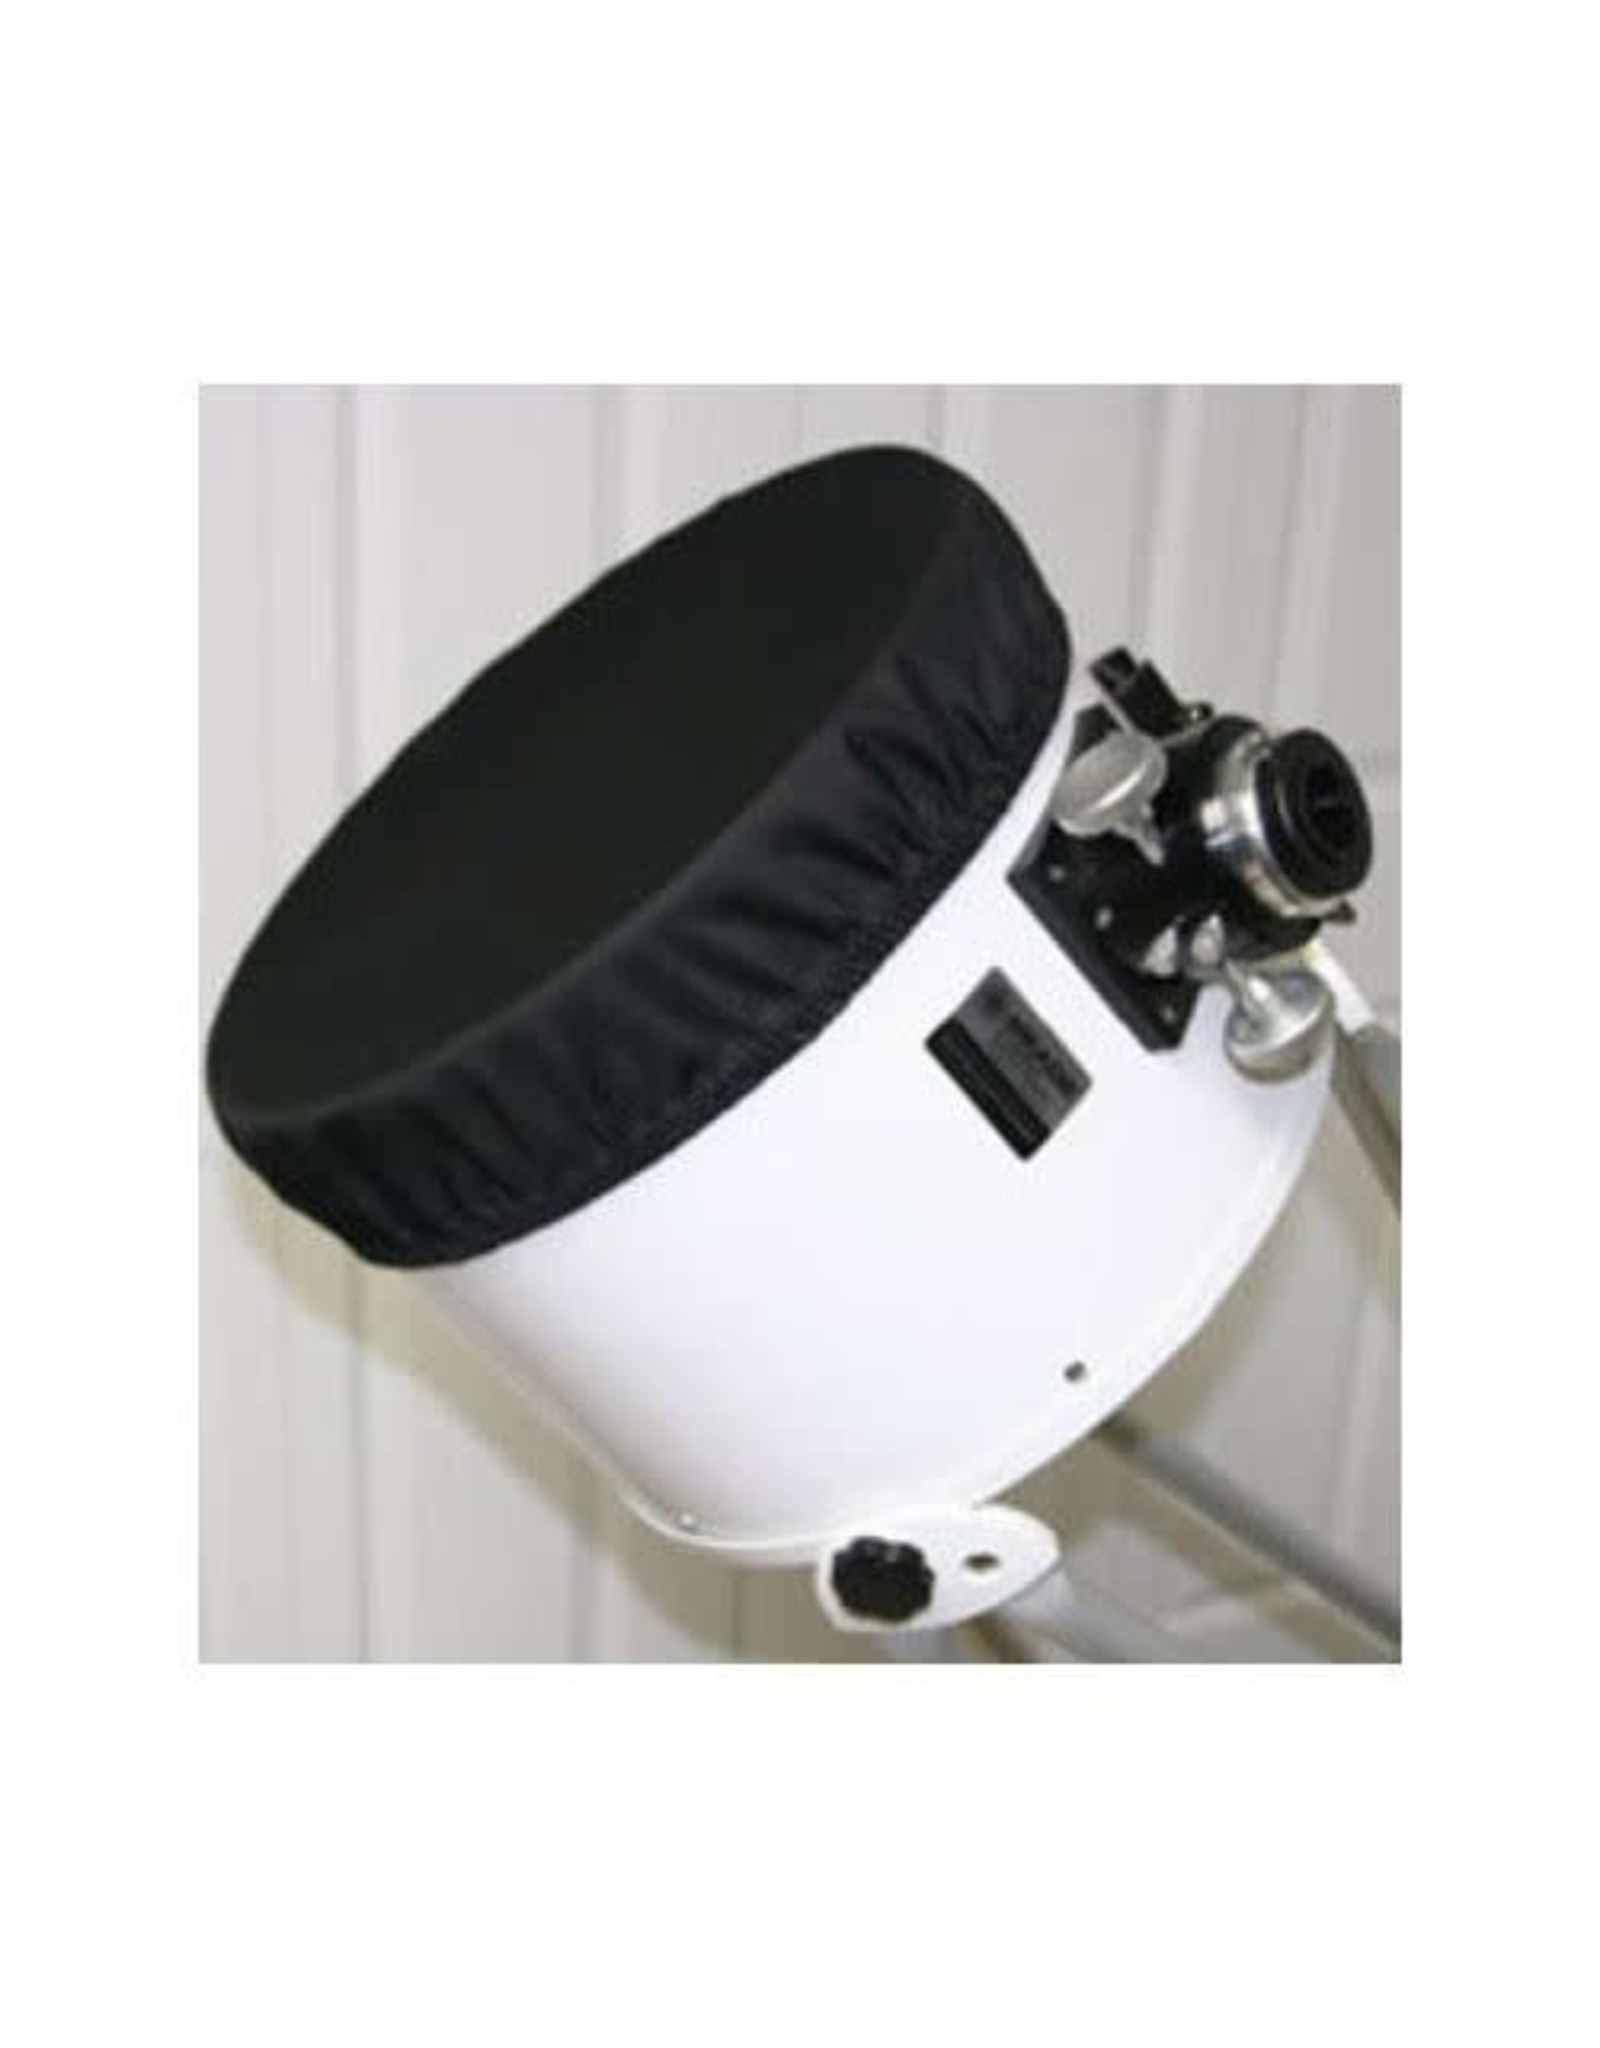 "Astrozap AstroZap 6"" Dobsonian Dust Cover - 8"" Diameter - AZ-1400"